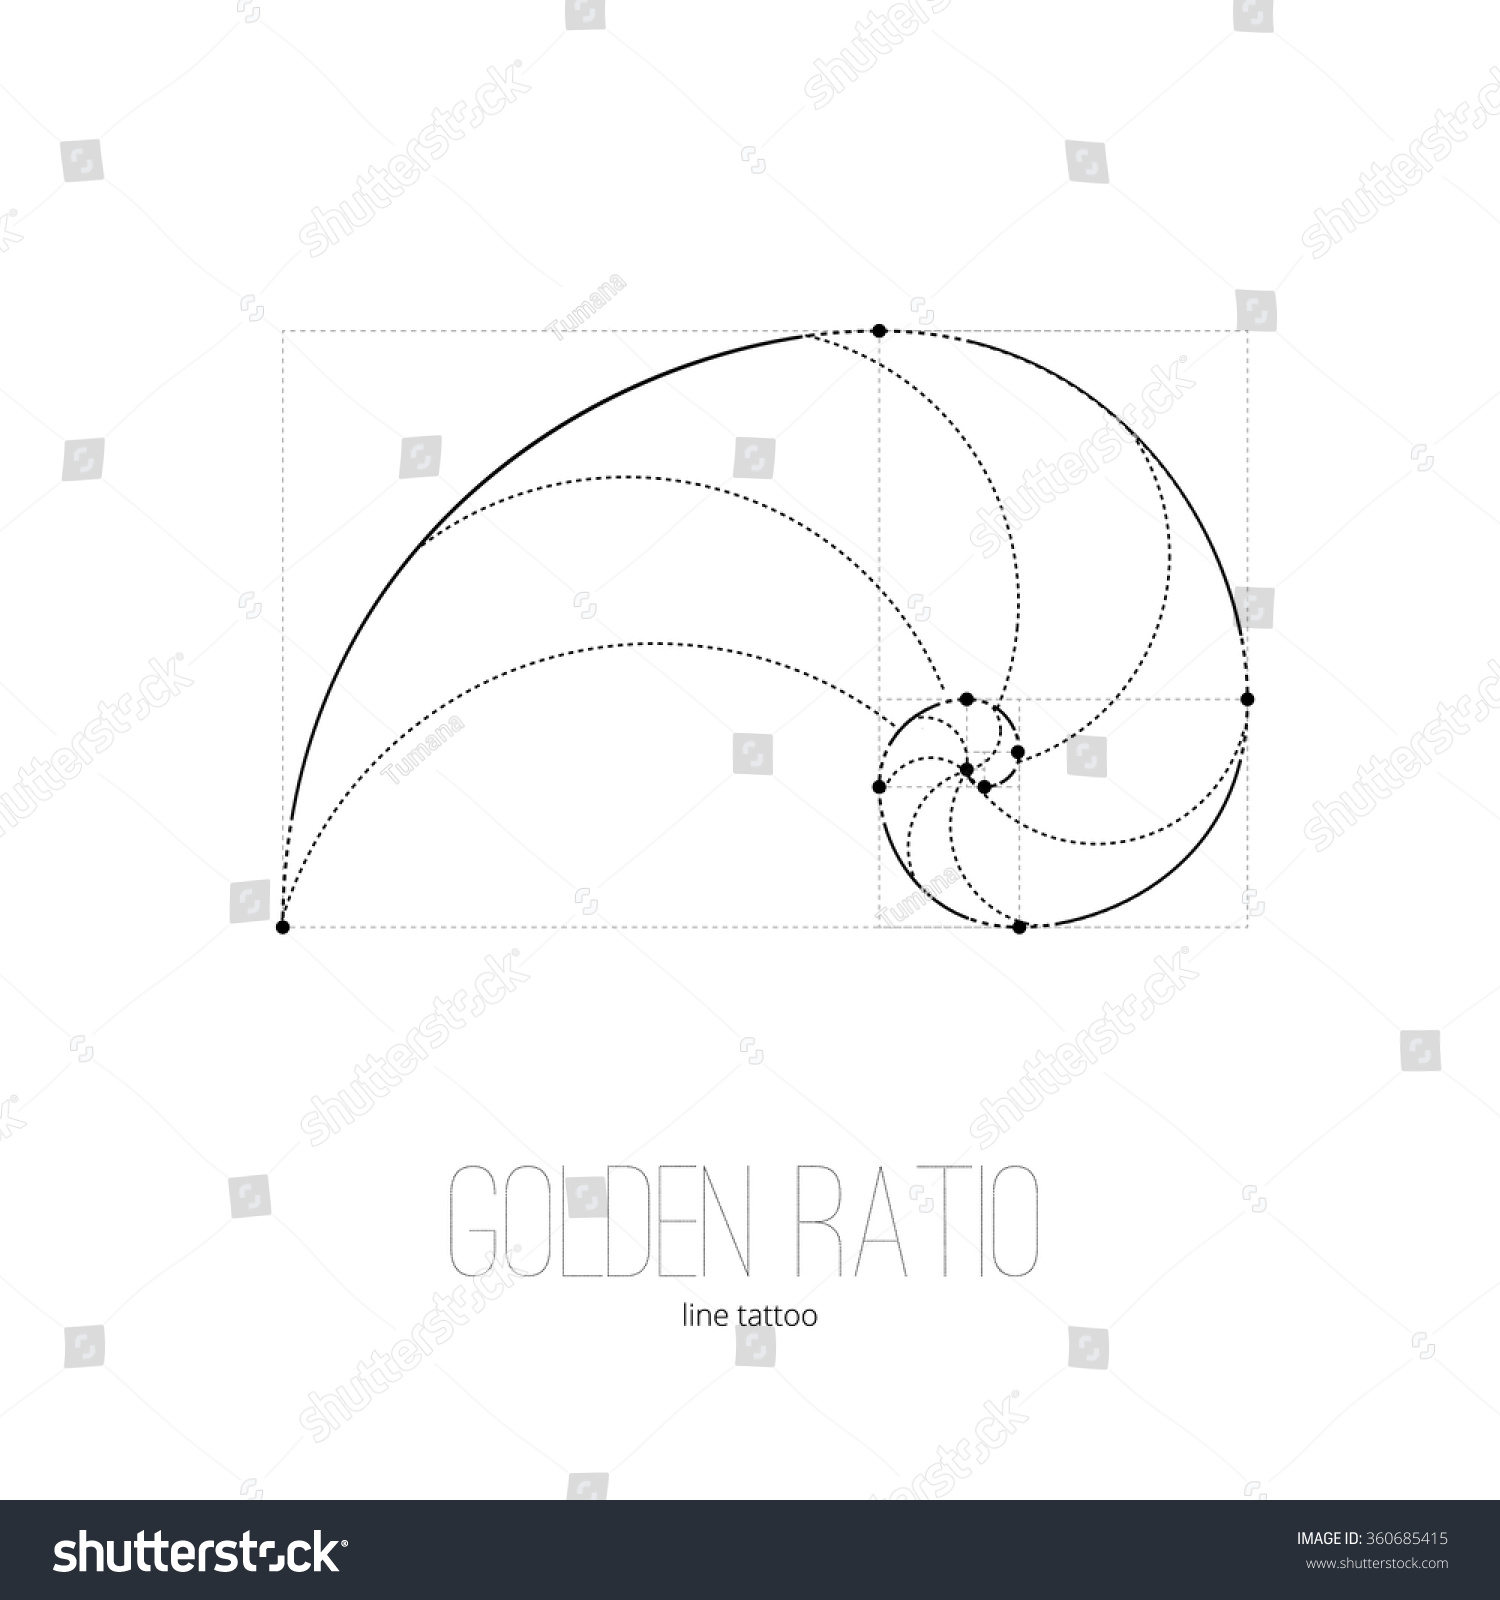 symbol golden ratio tattoo black lines stock vector 360685415 shutterstock. Black Bedroom Furniture Sets. Home Design Ideas